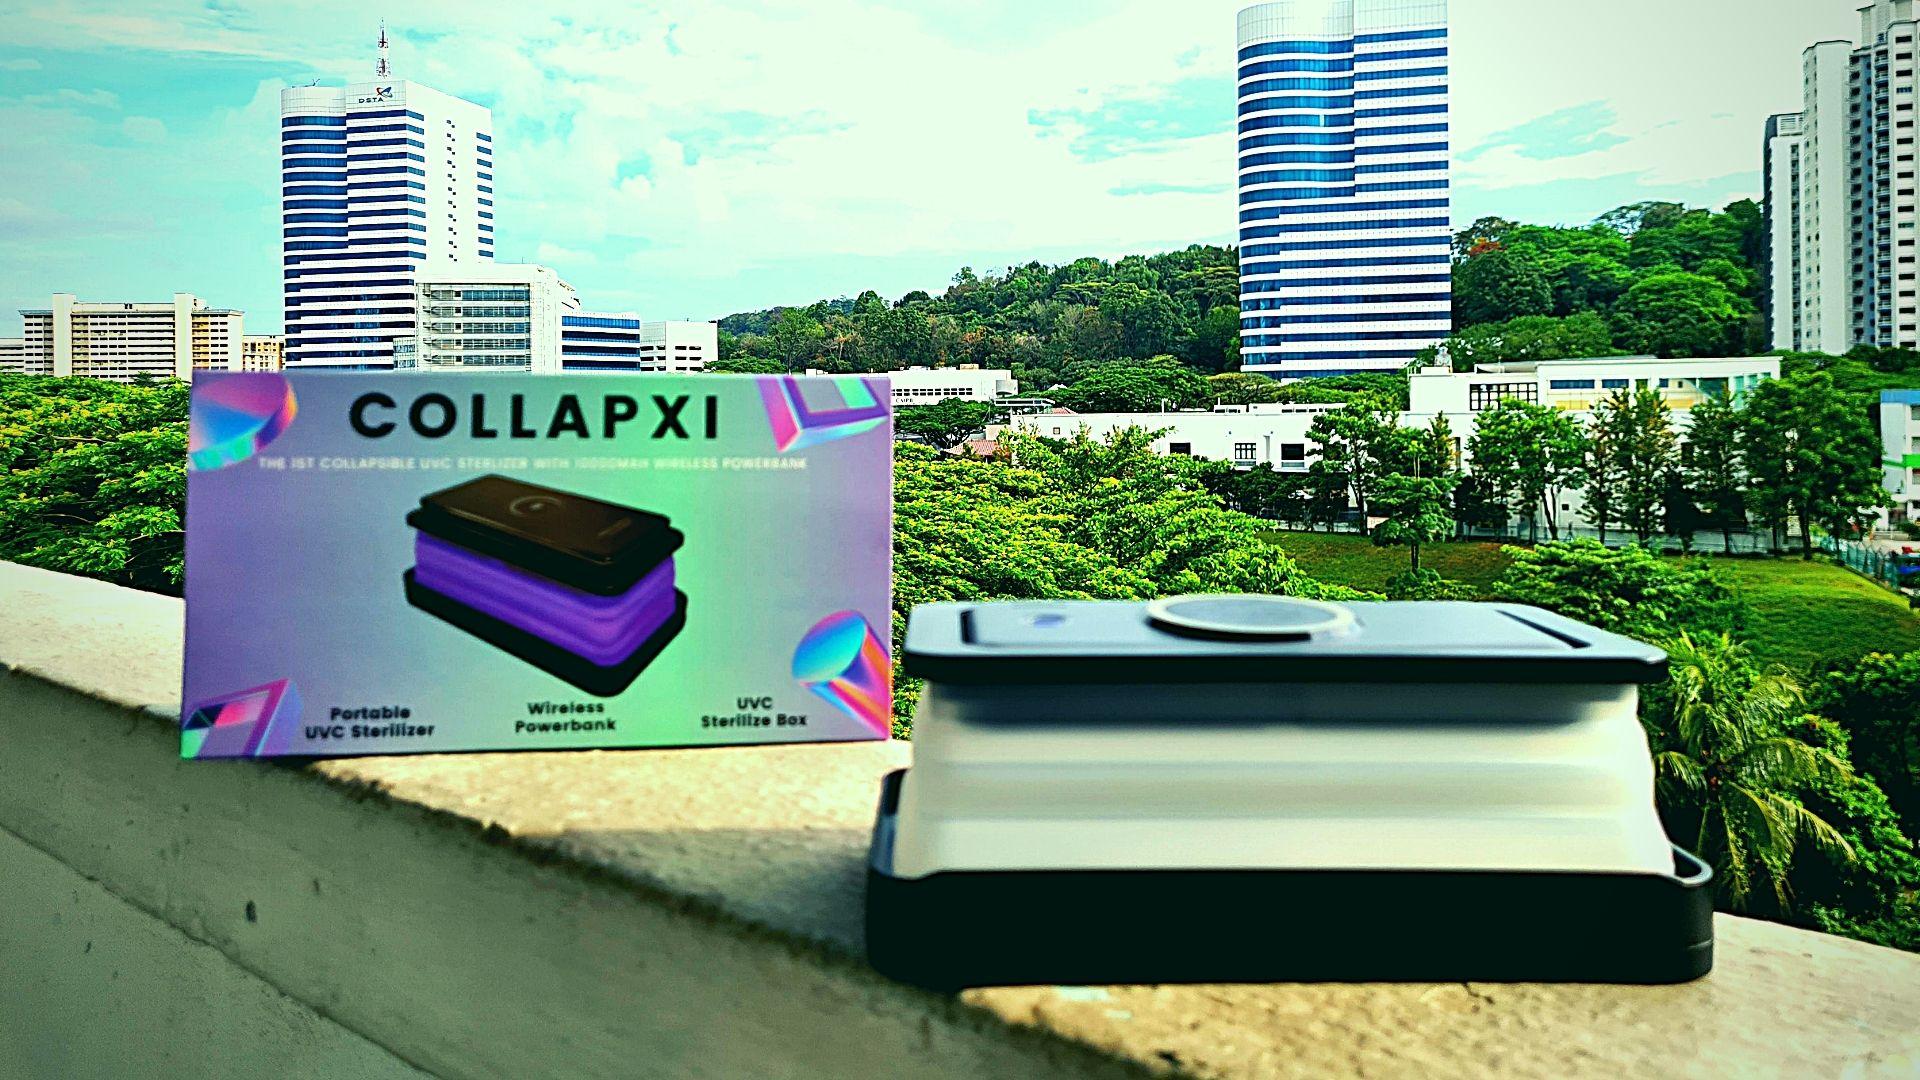 Collapxi Powerbank Box